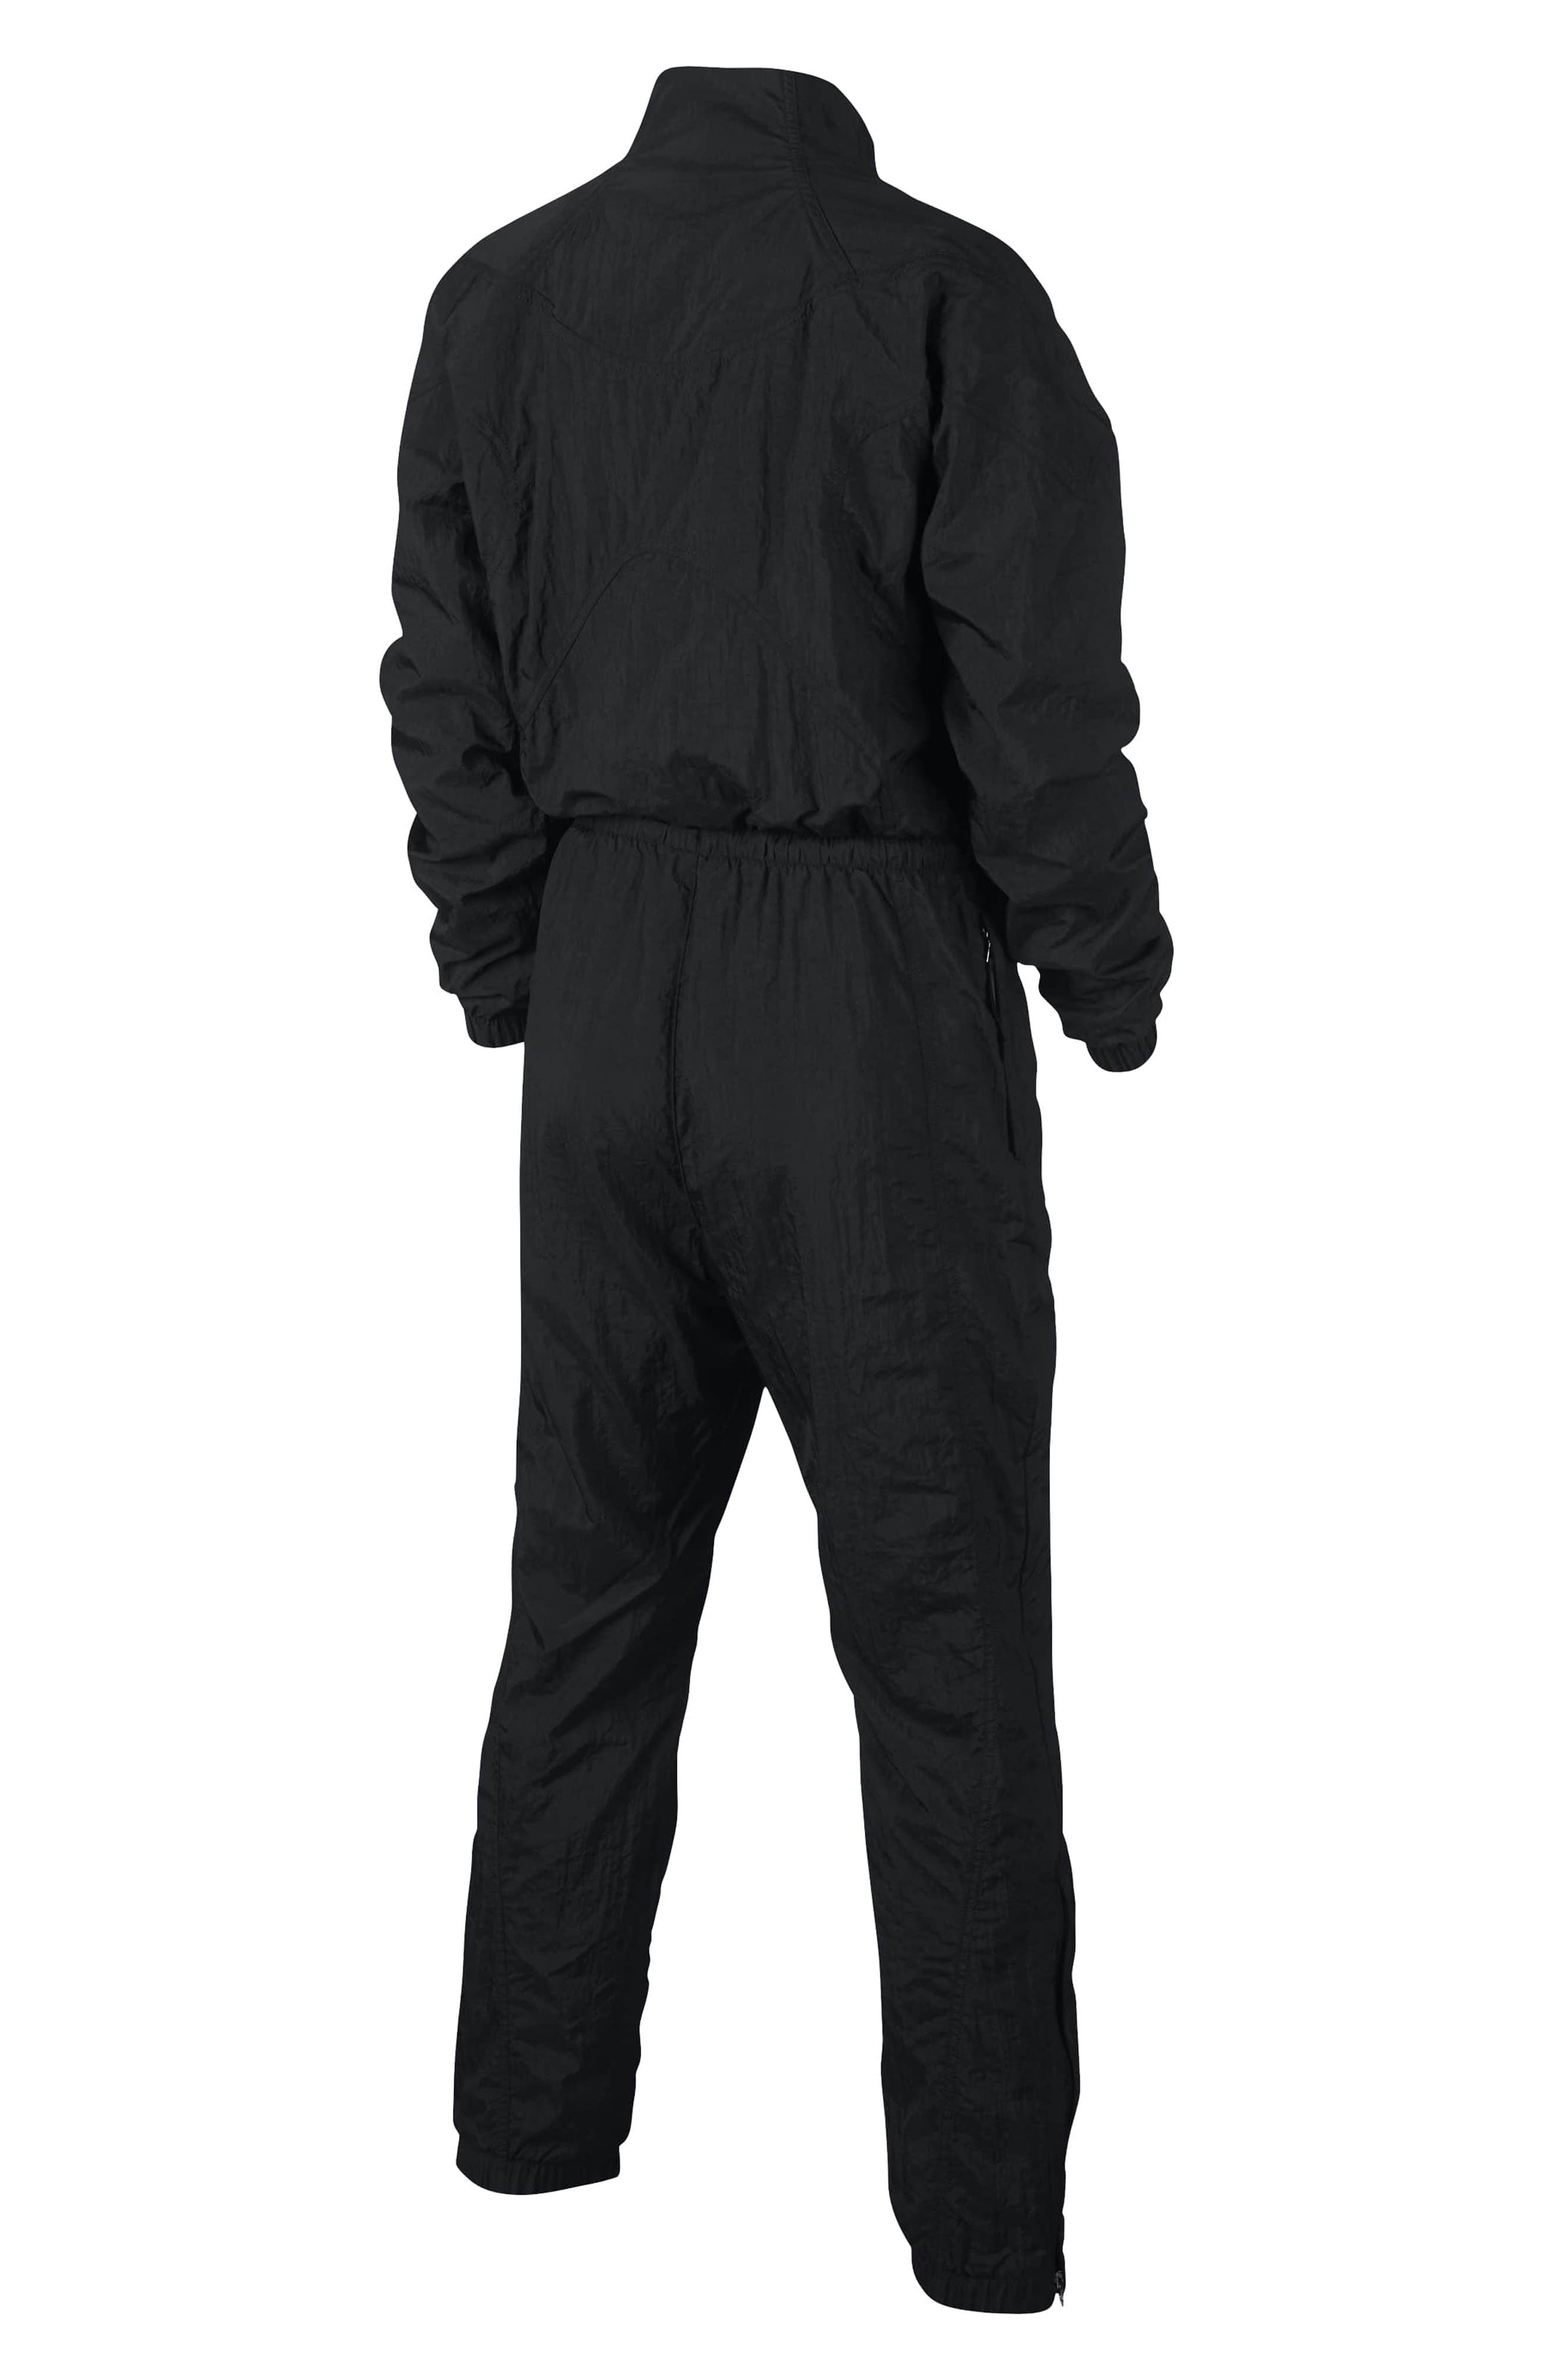 NikeLab Women's Jumpsuit,                             Alternate thumbnail 2, color,                             BLACK/ BLACK